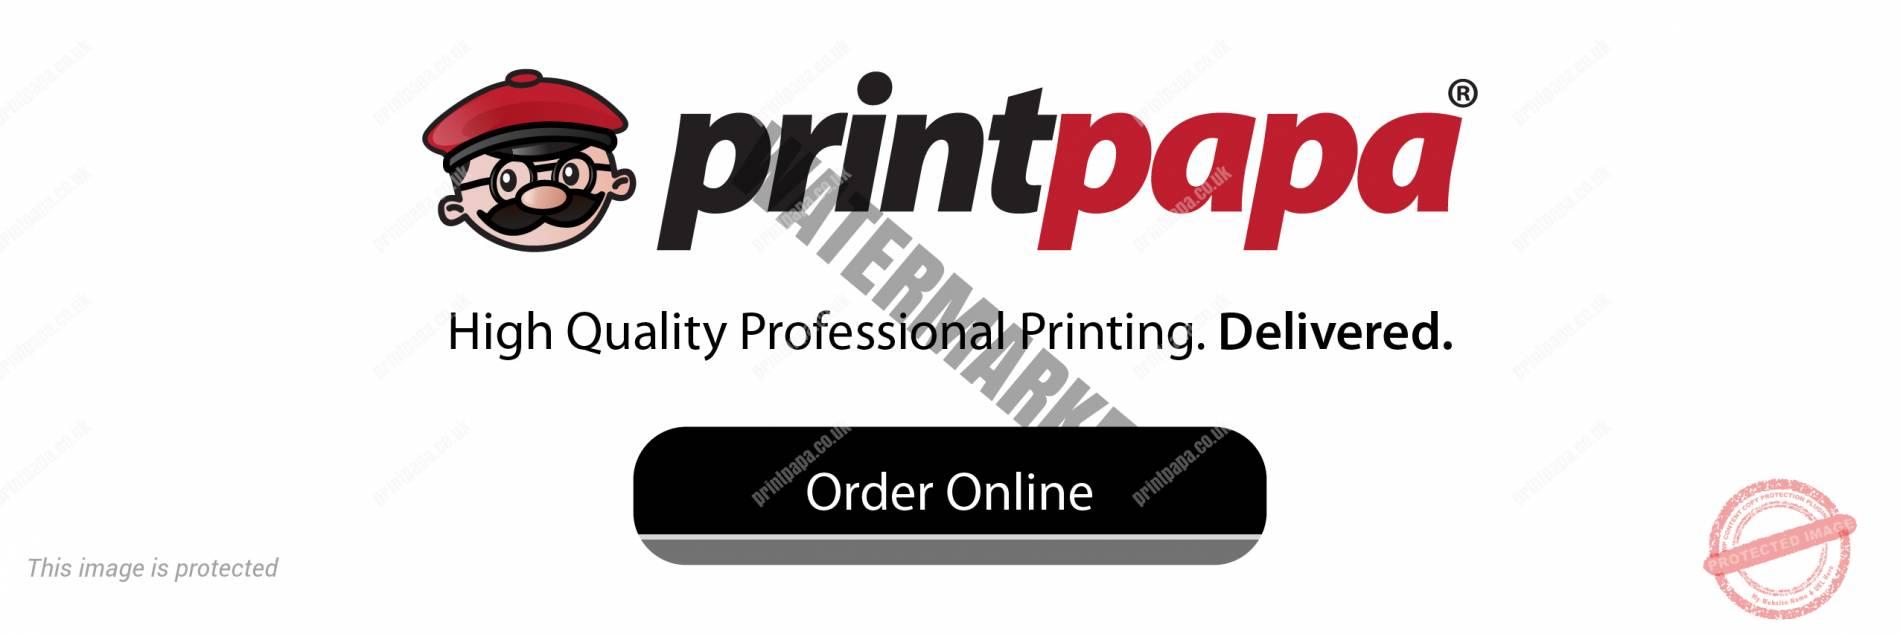 PrintPapa Banner